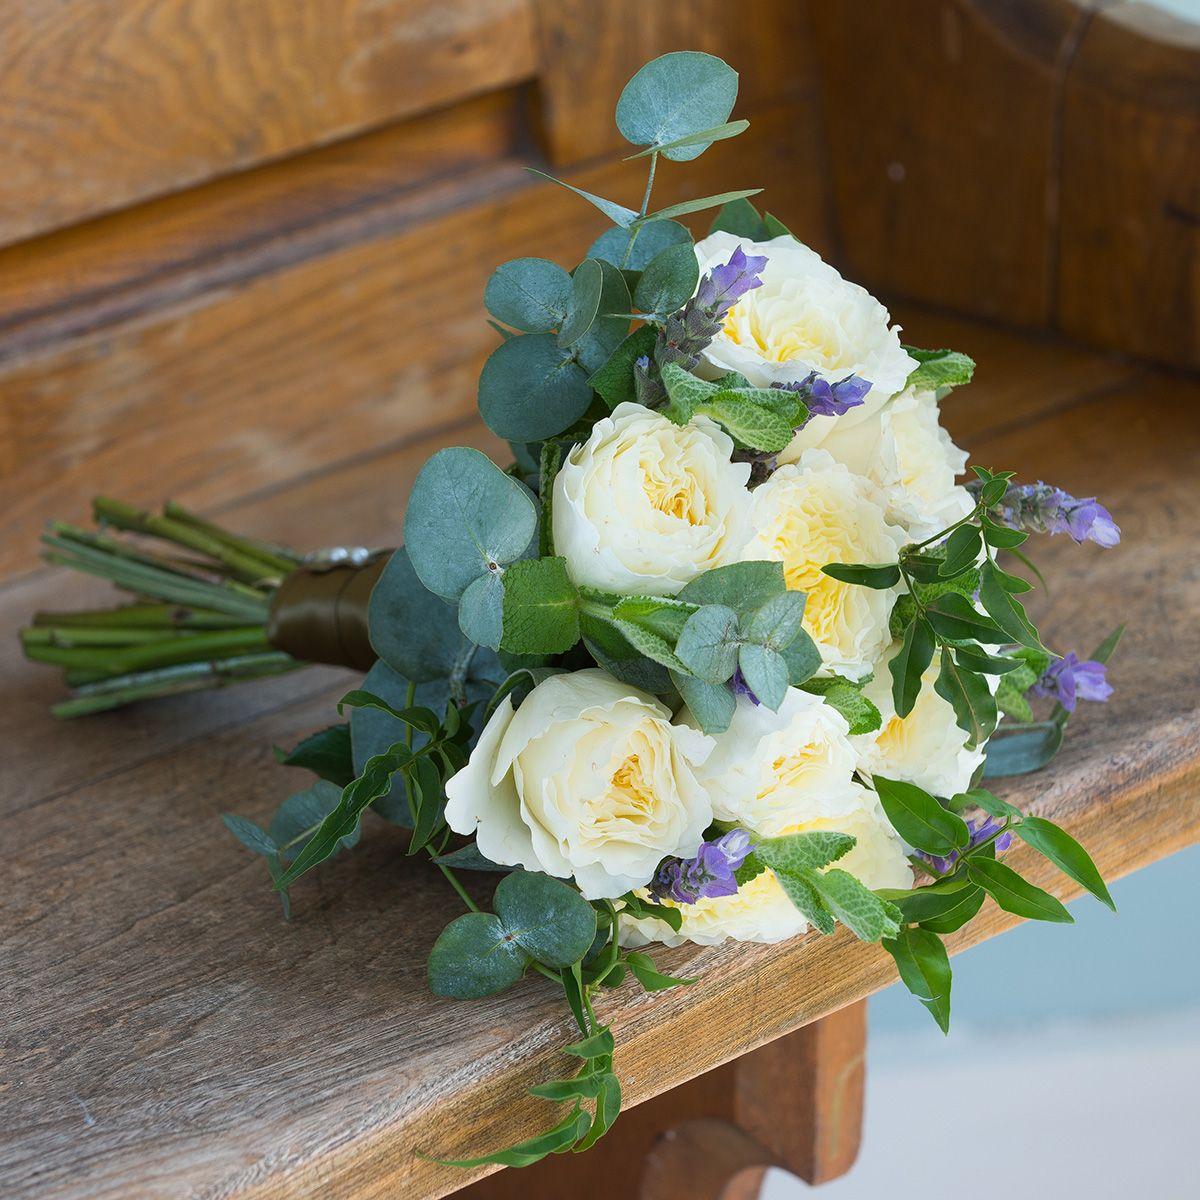 David austin patience bridesmaid bouquet david austin patience bridesmaid flower girl bouquet izmirmasajfo